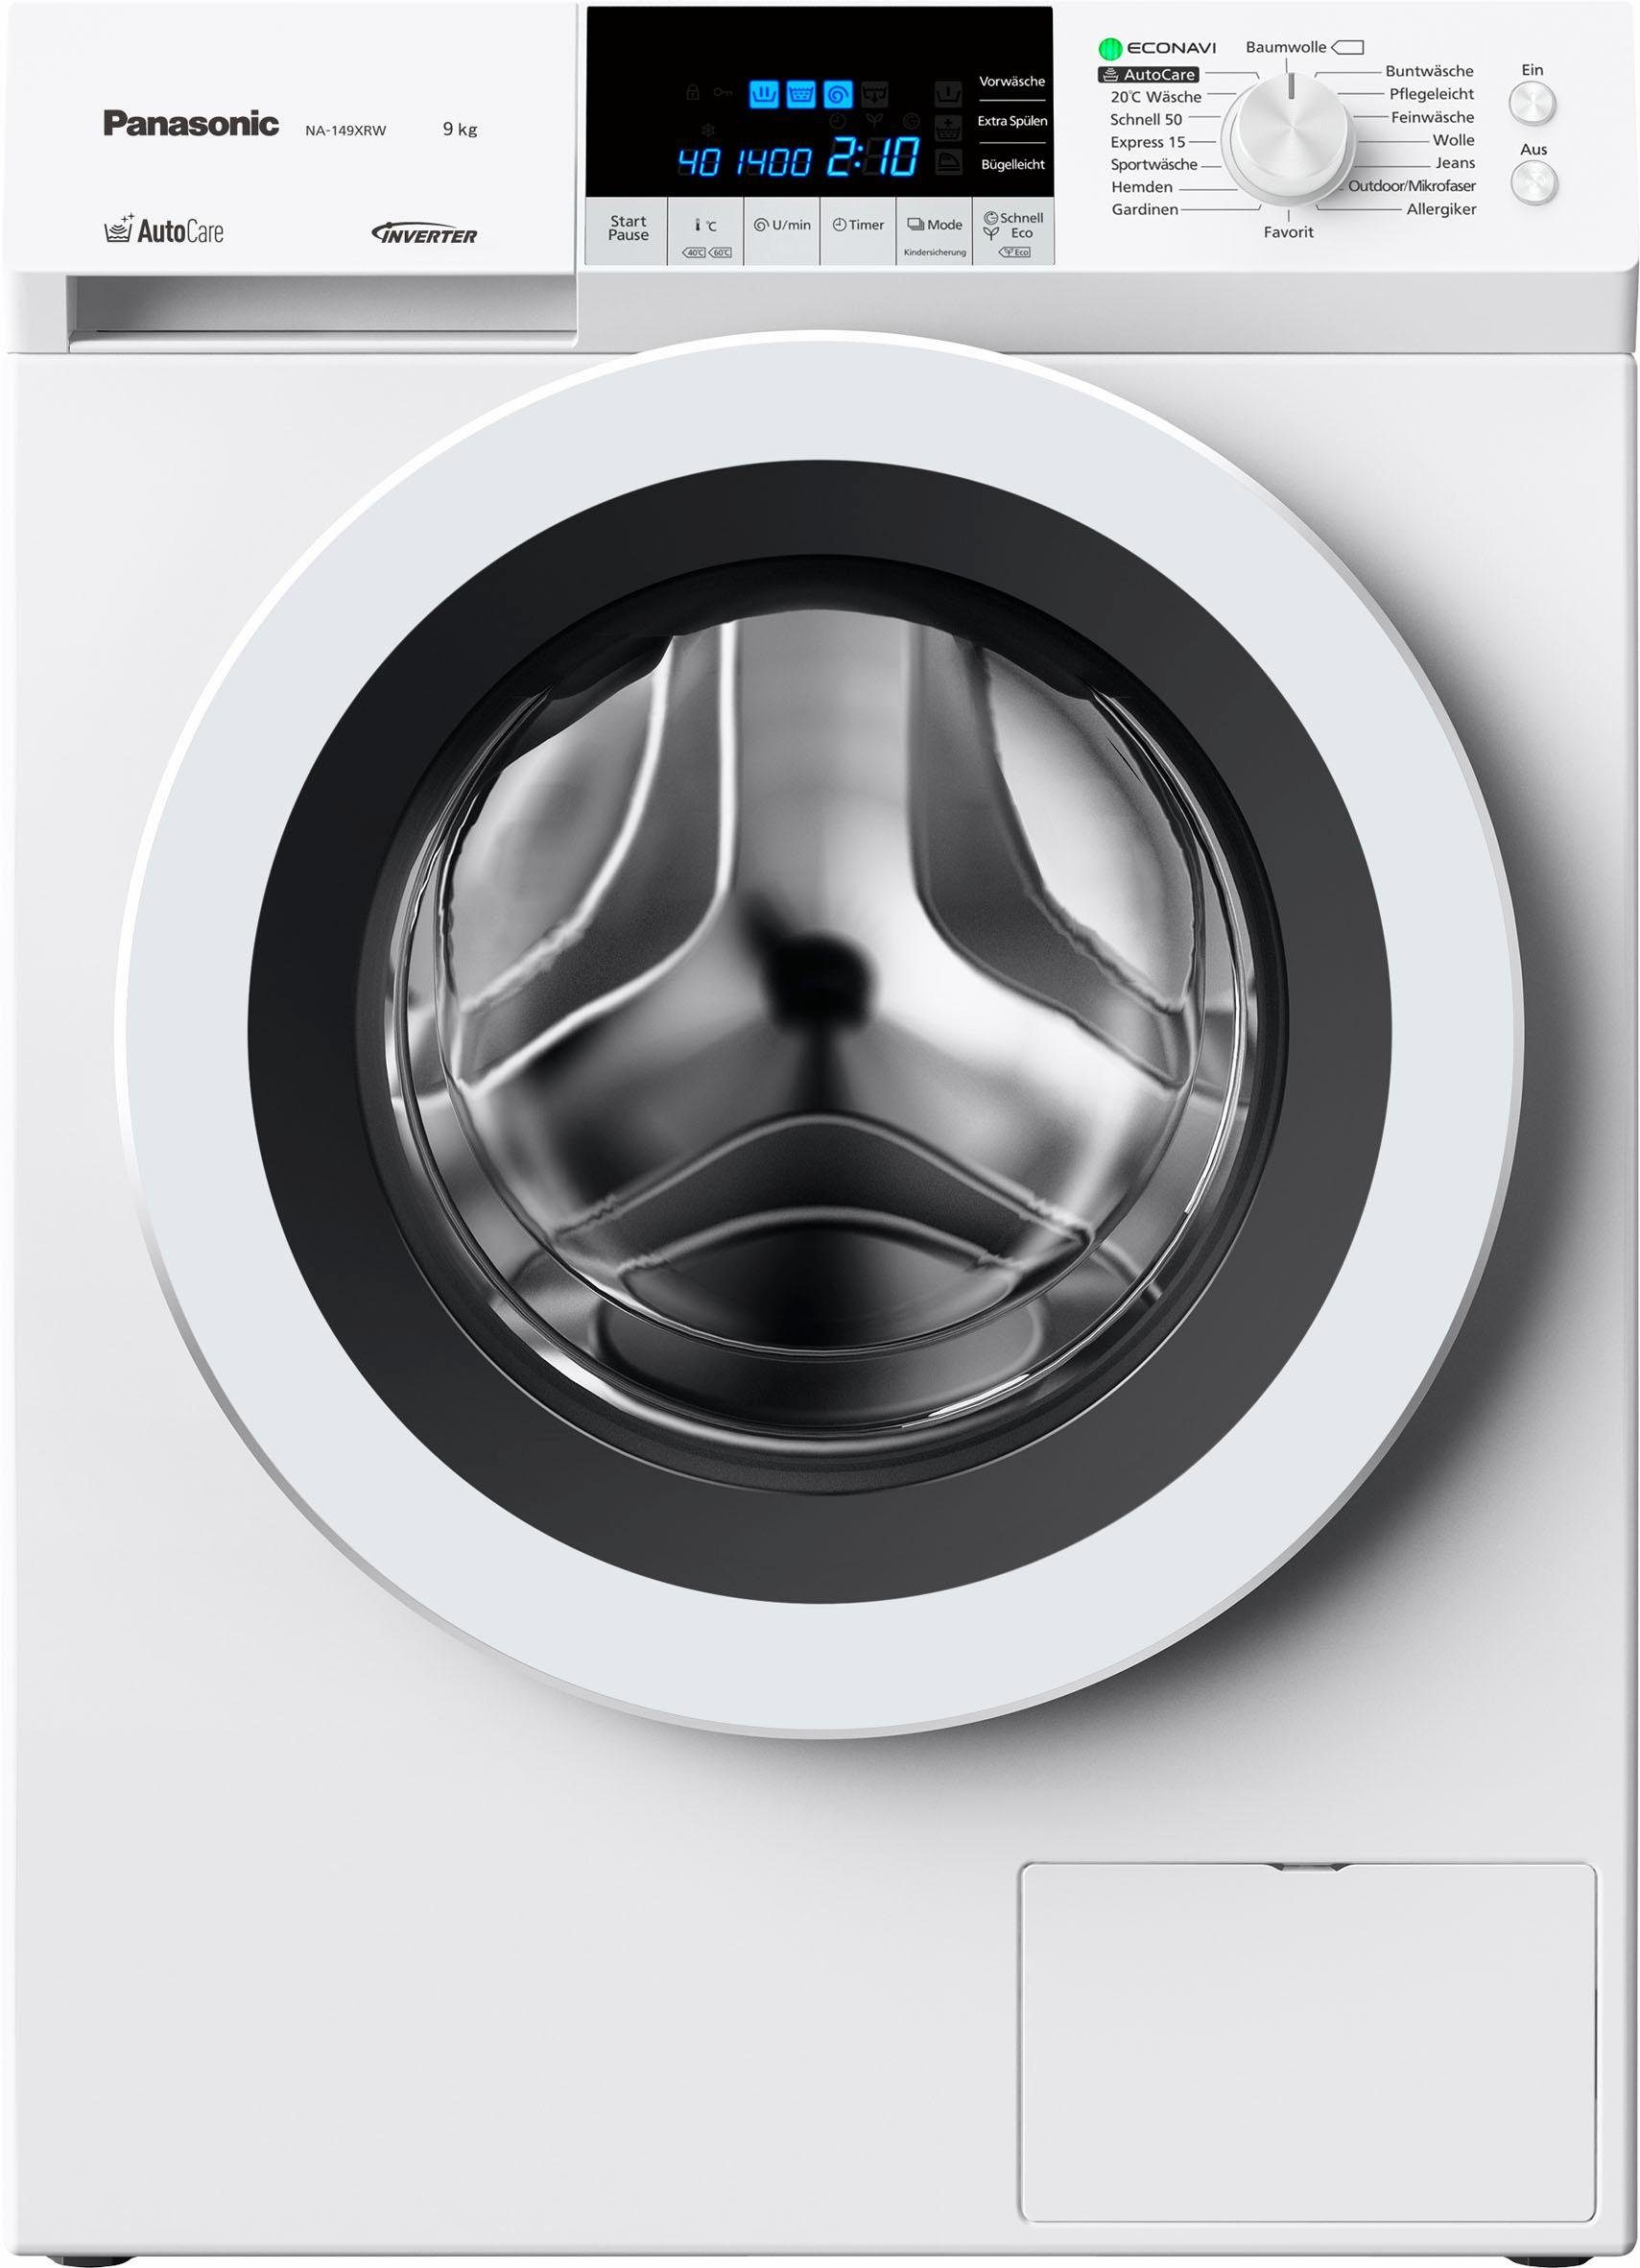 Panasonic Waschmaschine NA-149XRW, 9 kg, 1400 U/Min